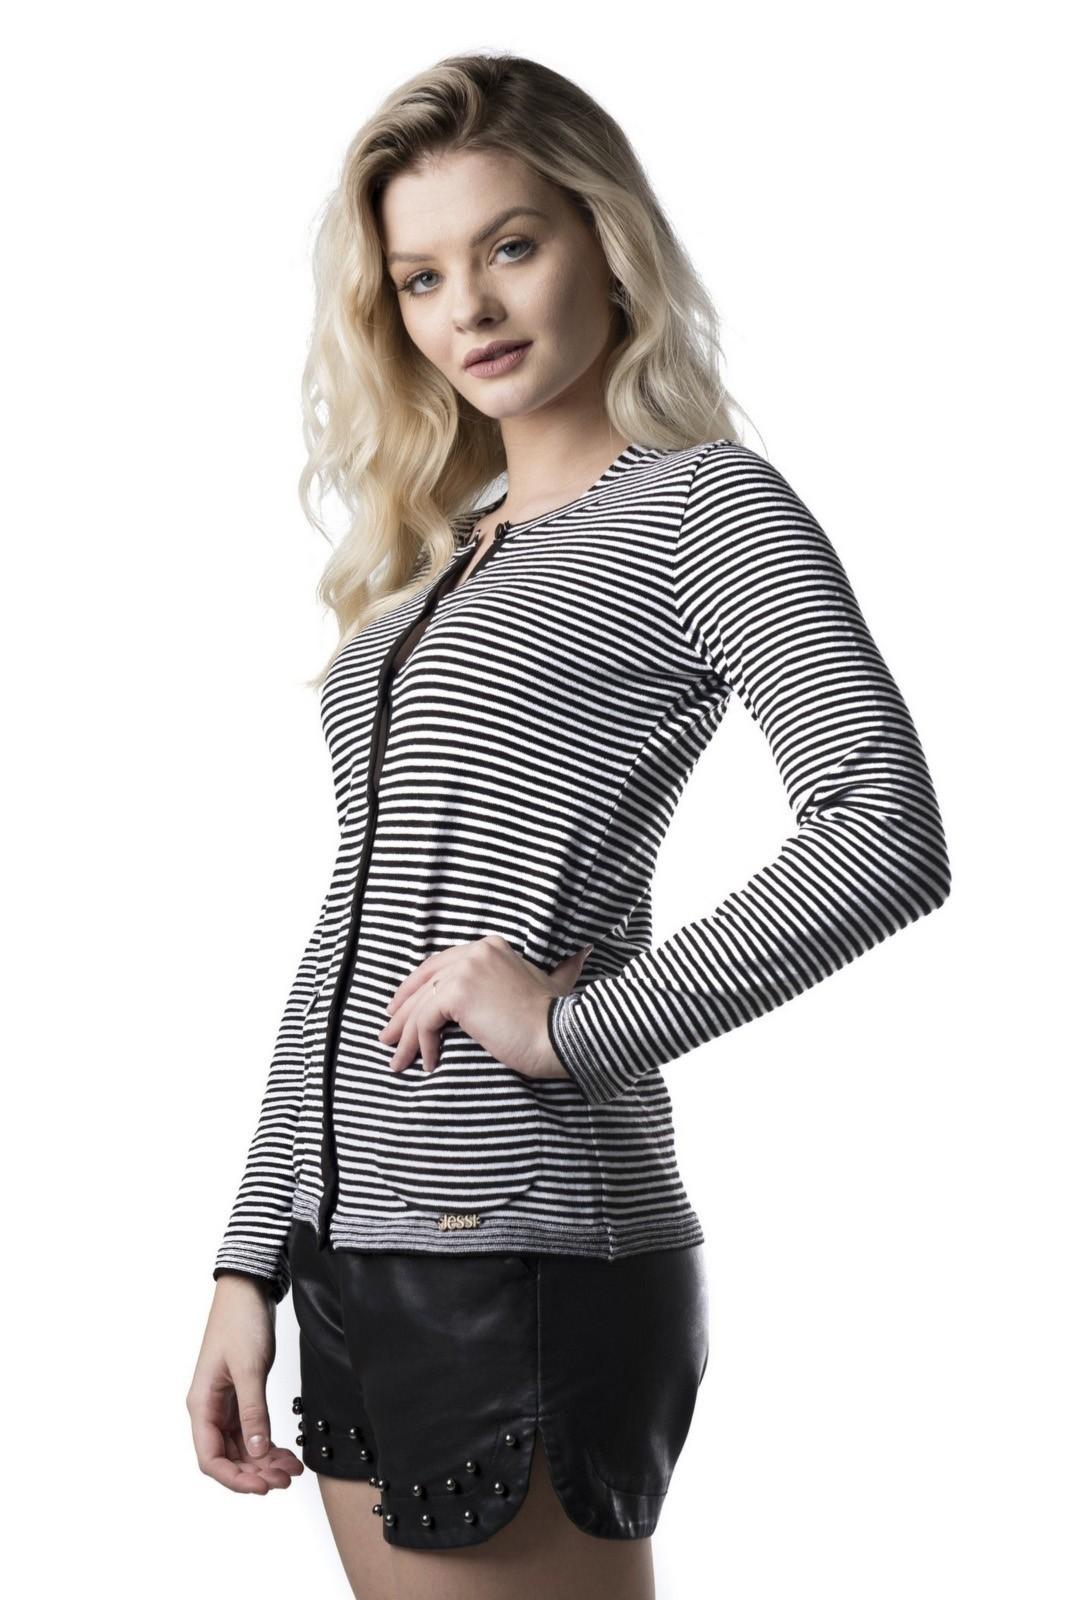 Cardigan Modal Jéssi Malhas tricô - Preto e Branco